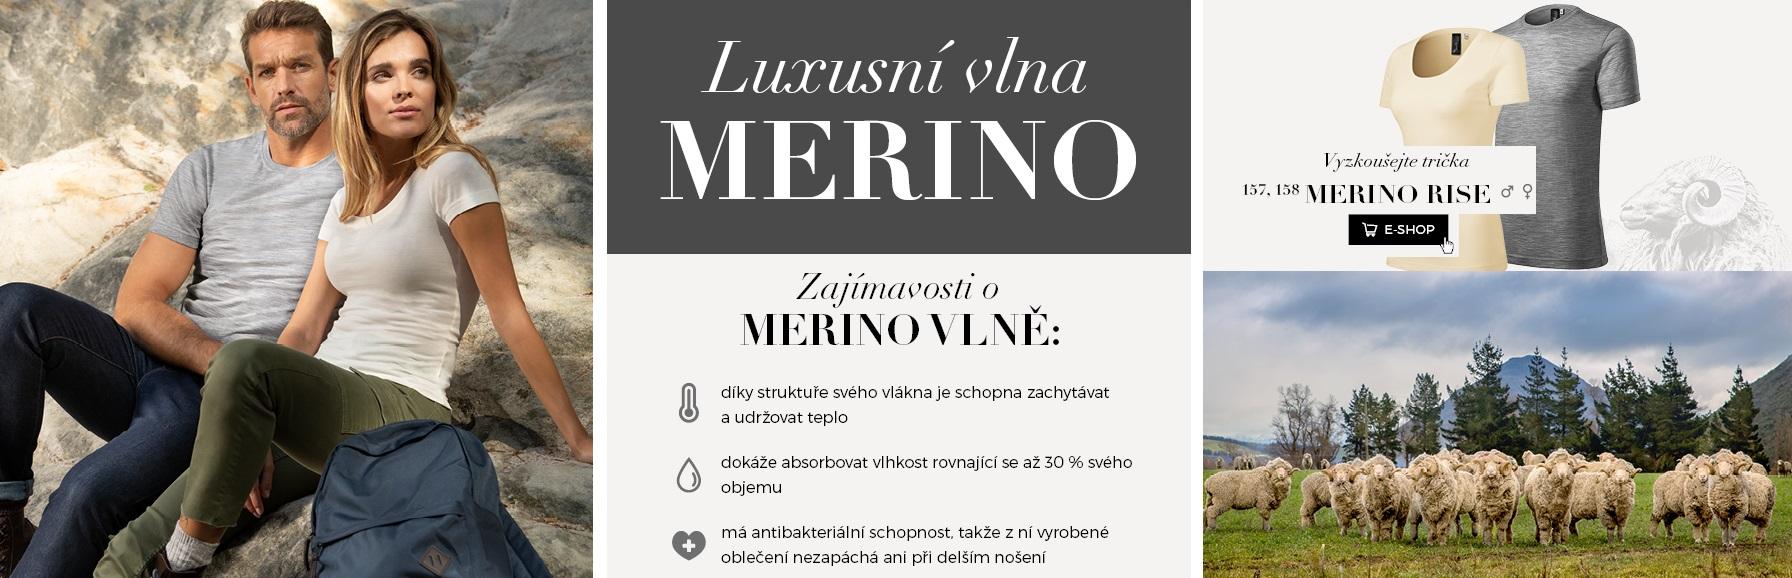 Merino_CZ